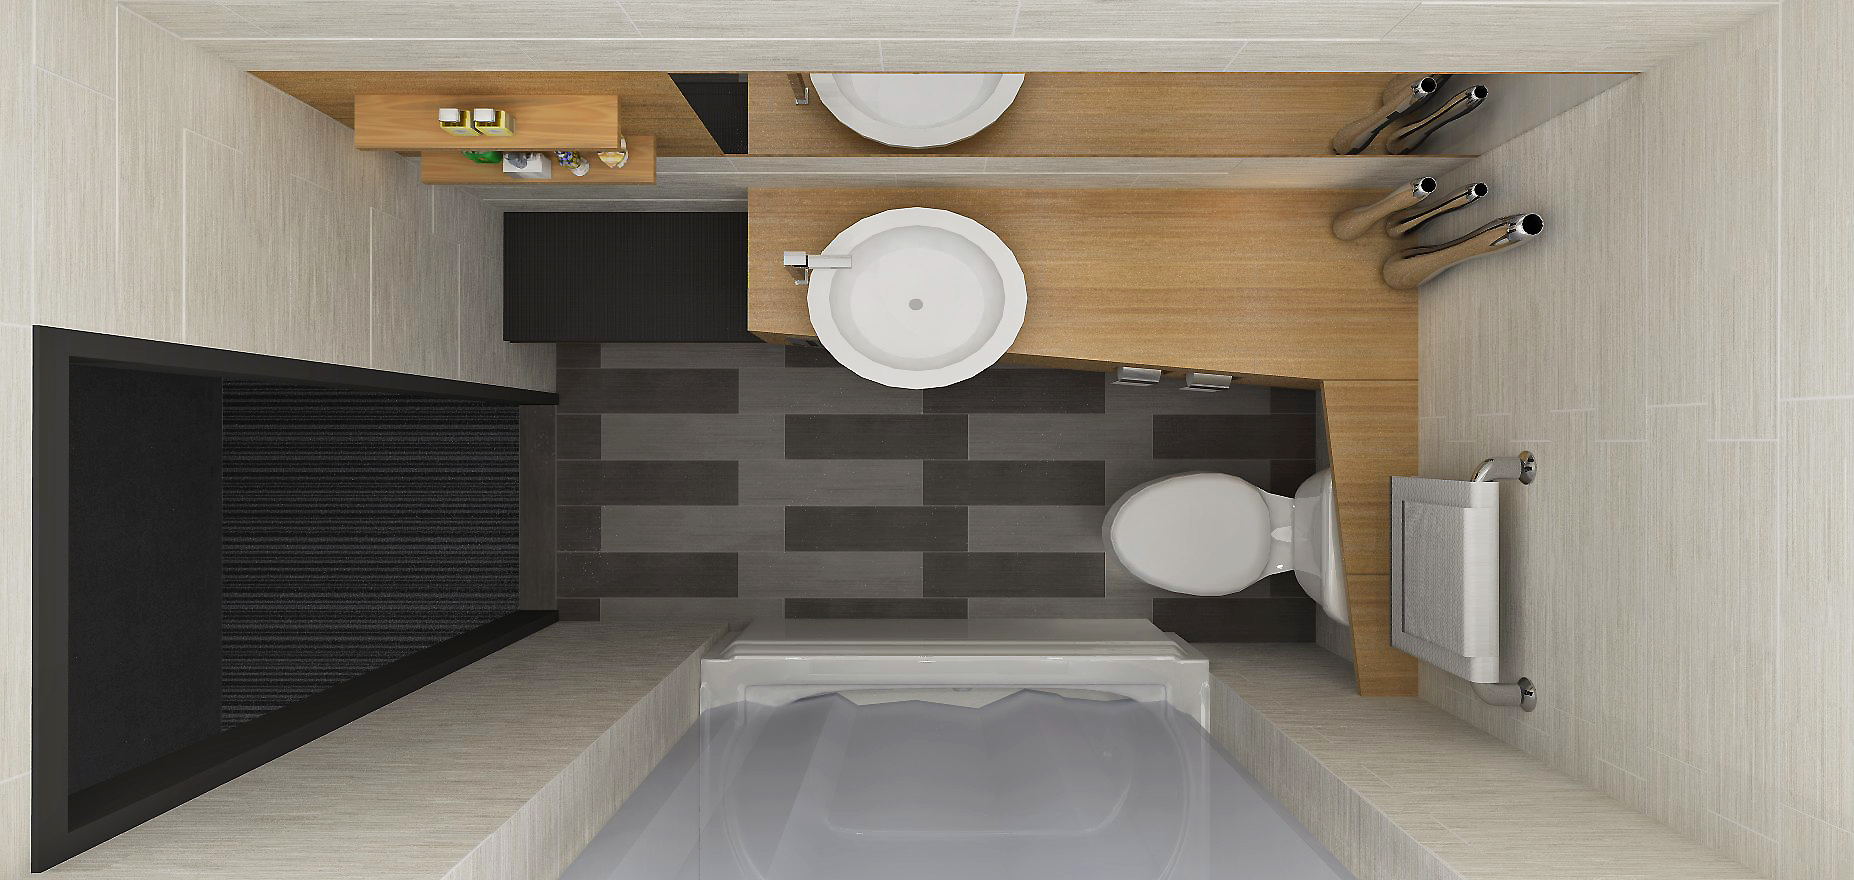 Salle de bain design intérieur hotel